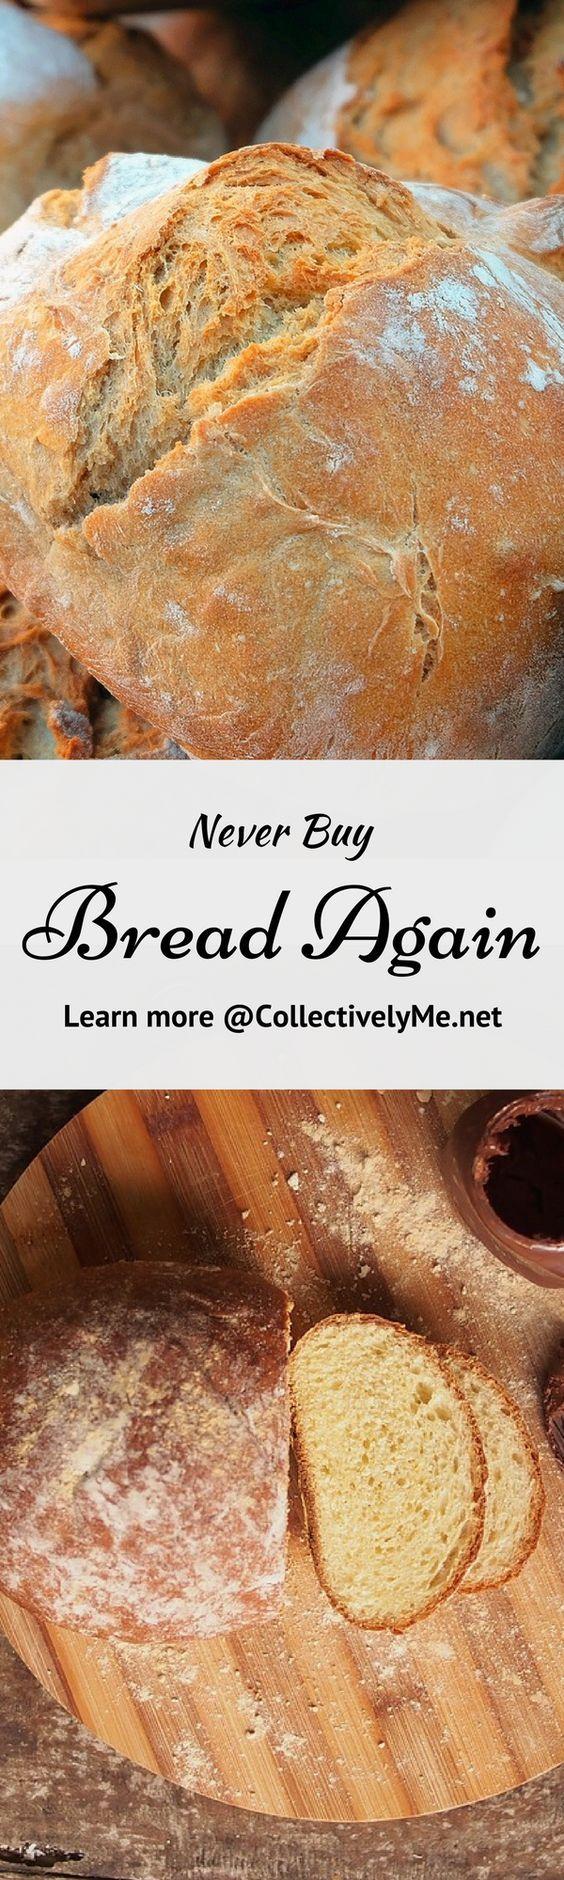 nice FREE 5 Ingredient Bread Recipe